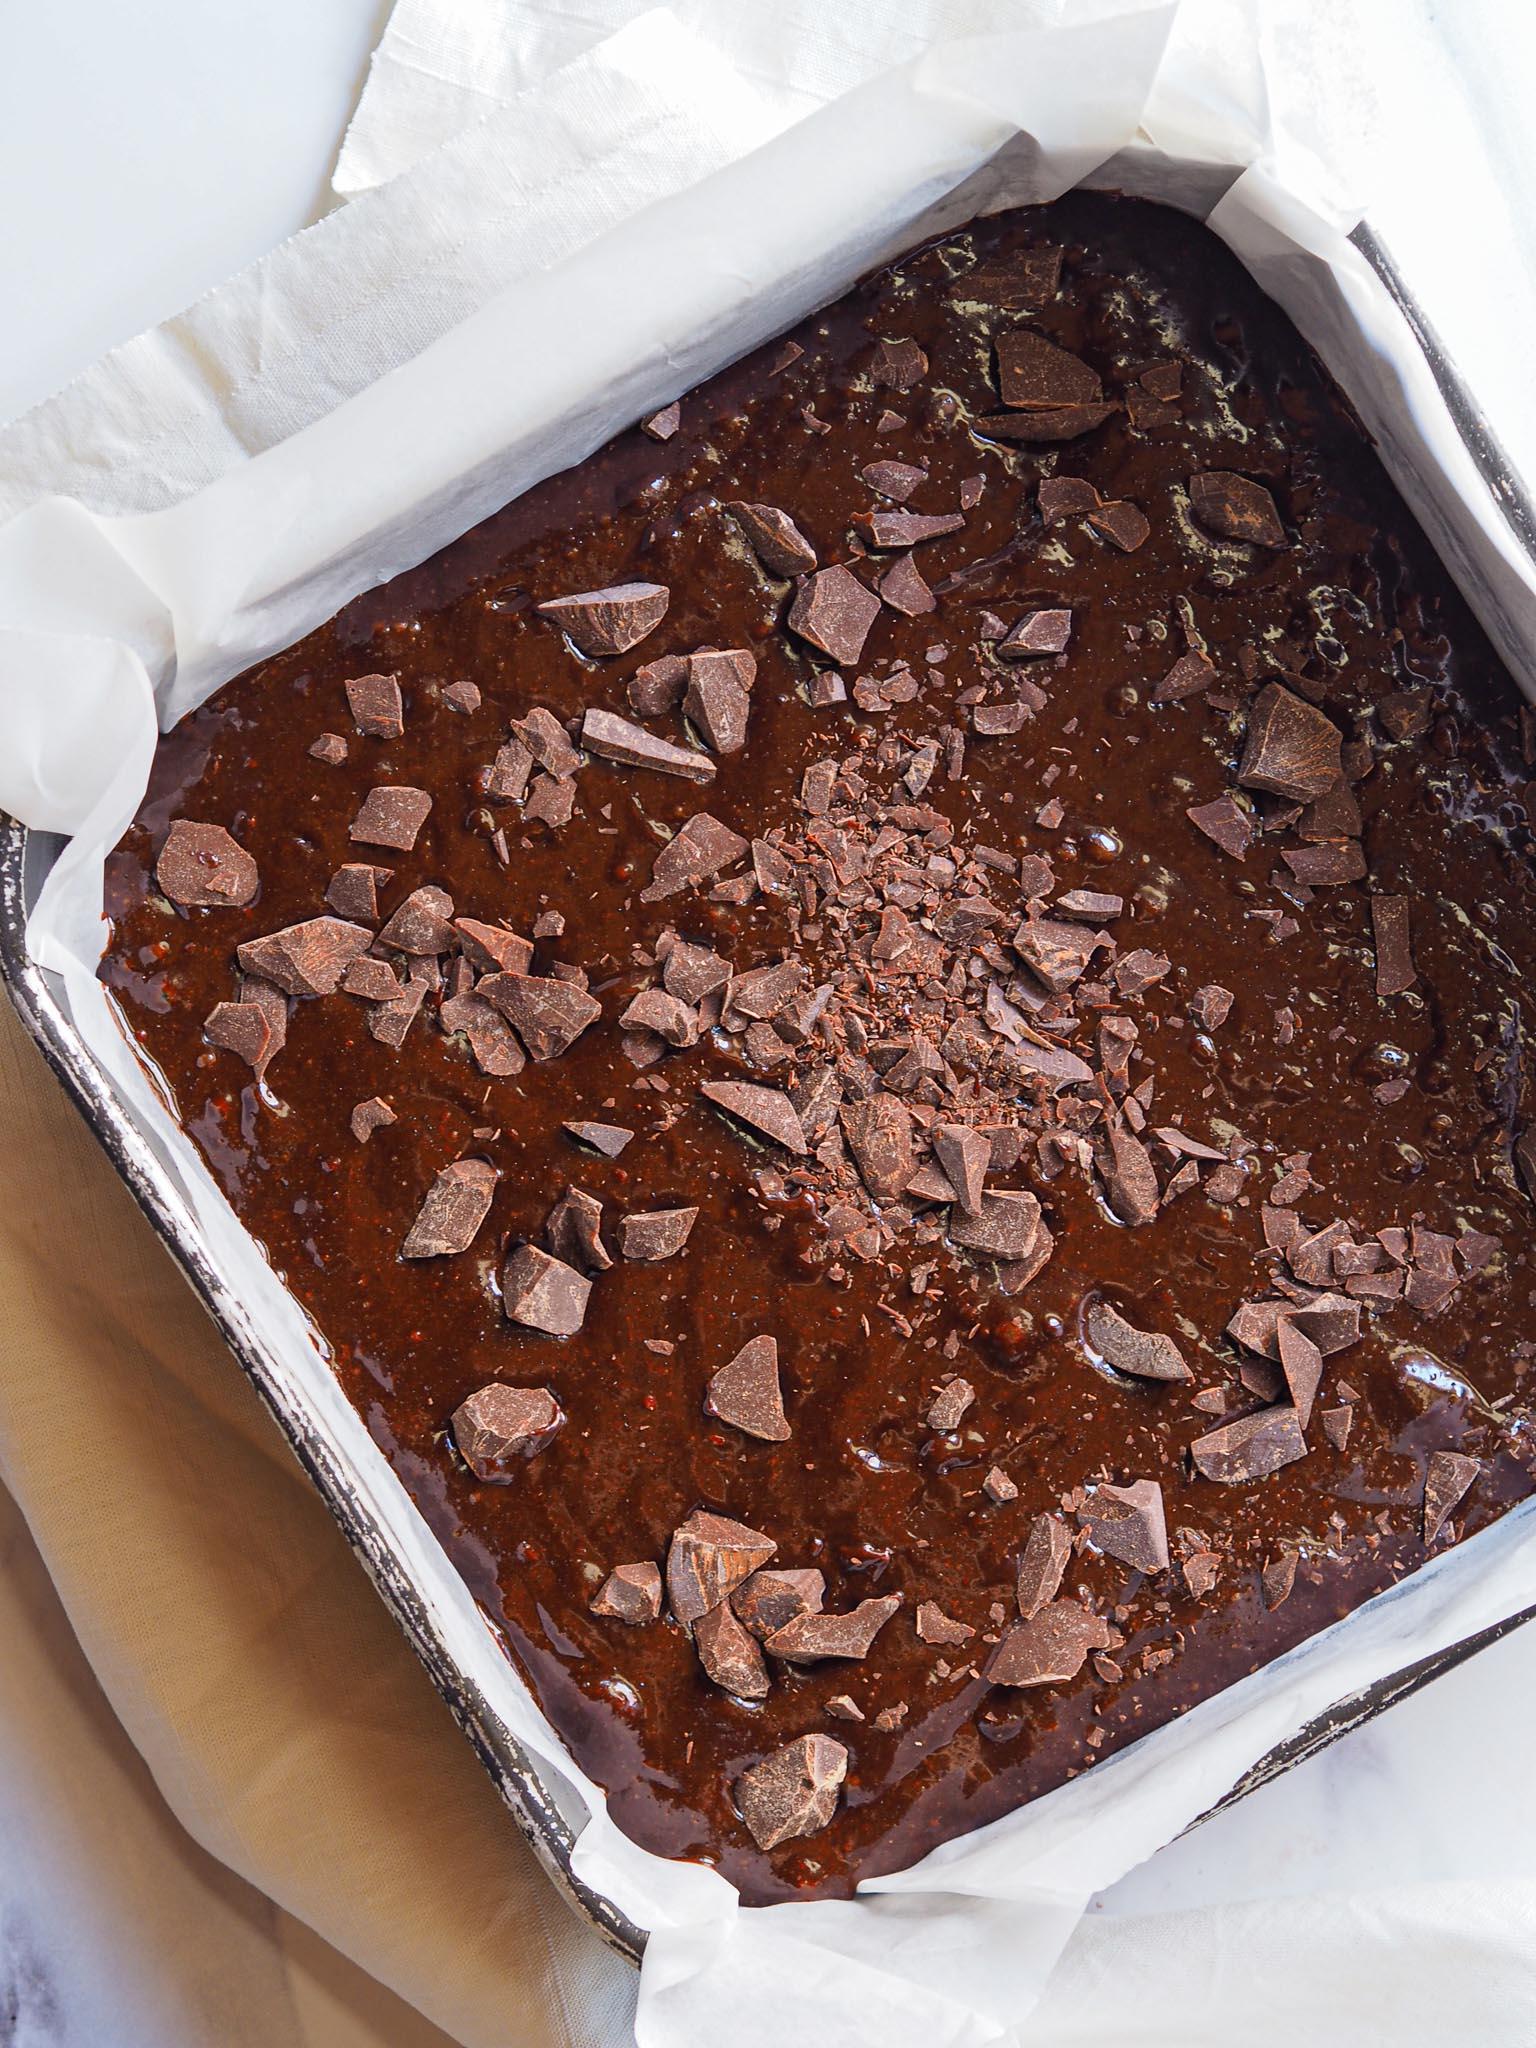 Chocolate brownie recipe step 7